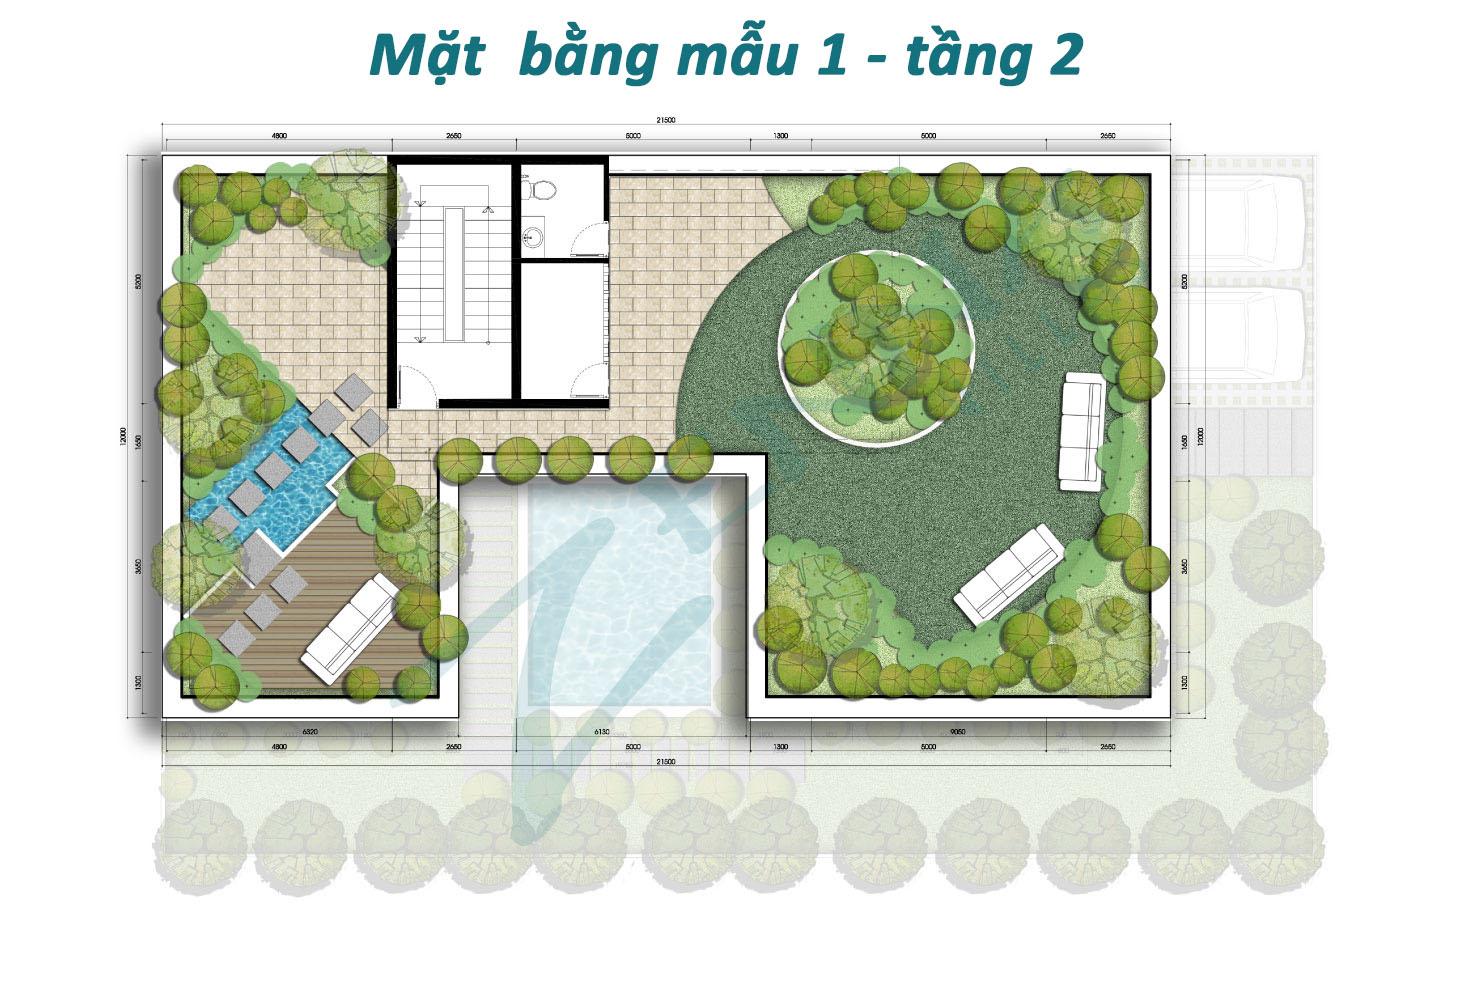 Mặt bằng tầng 2 mẫu 1 biệt thự Zenna Villas